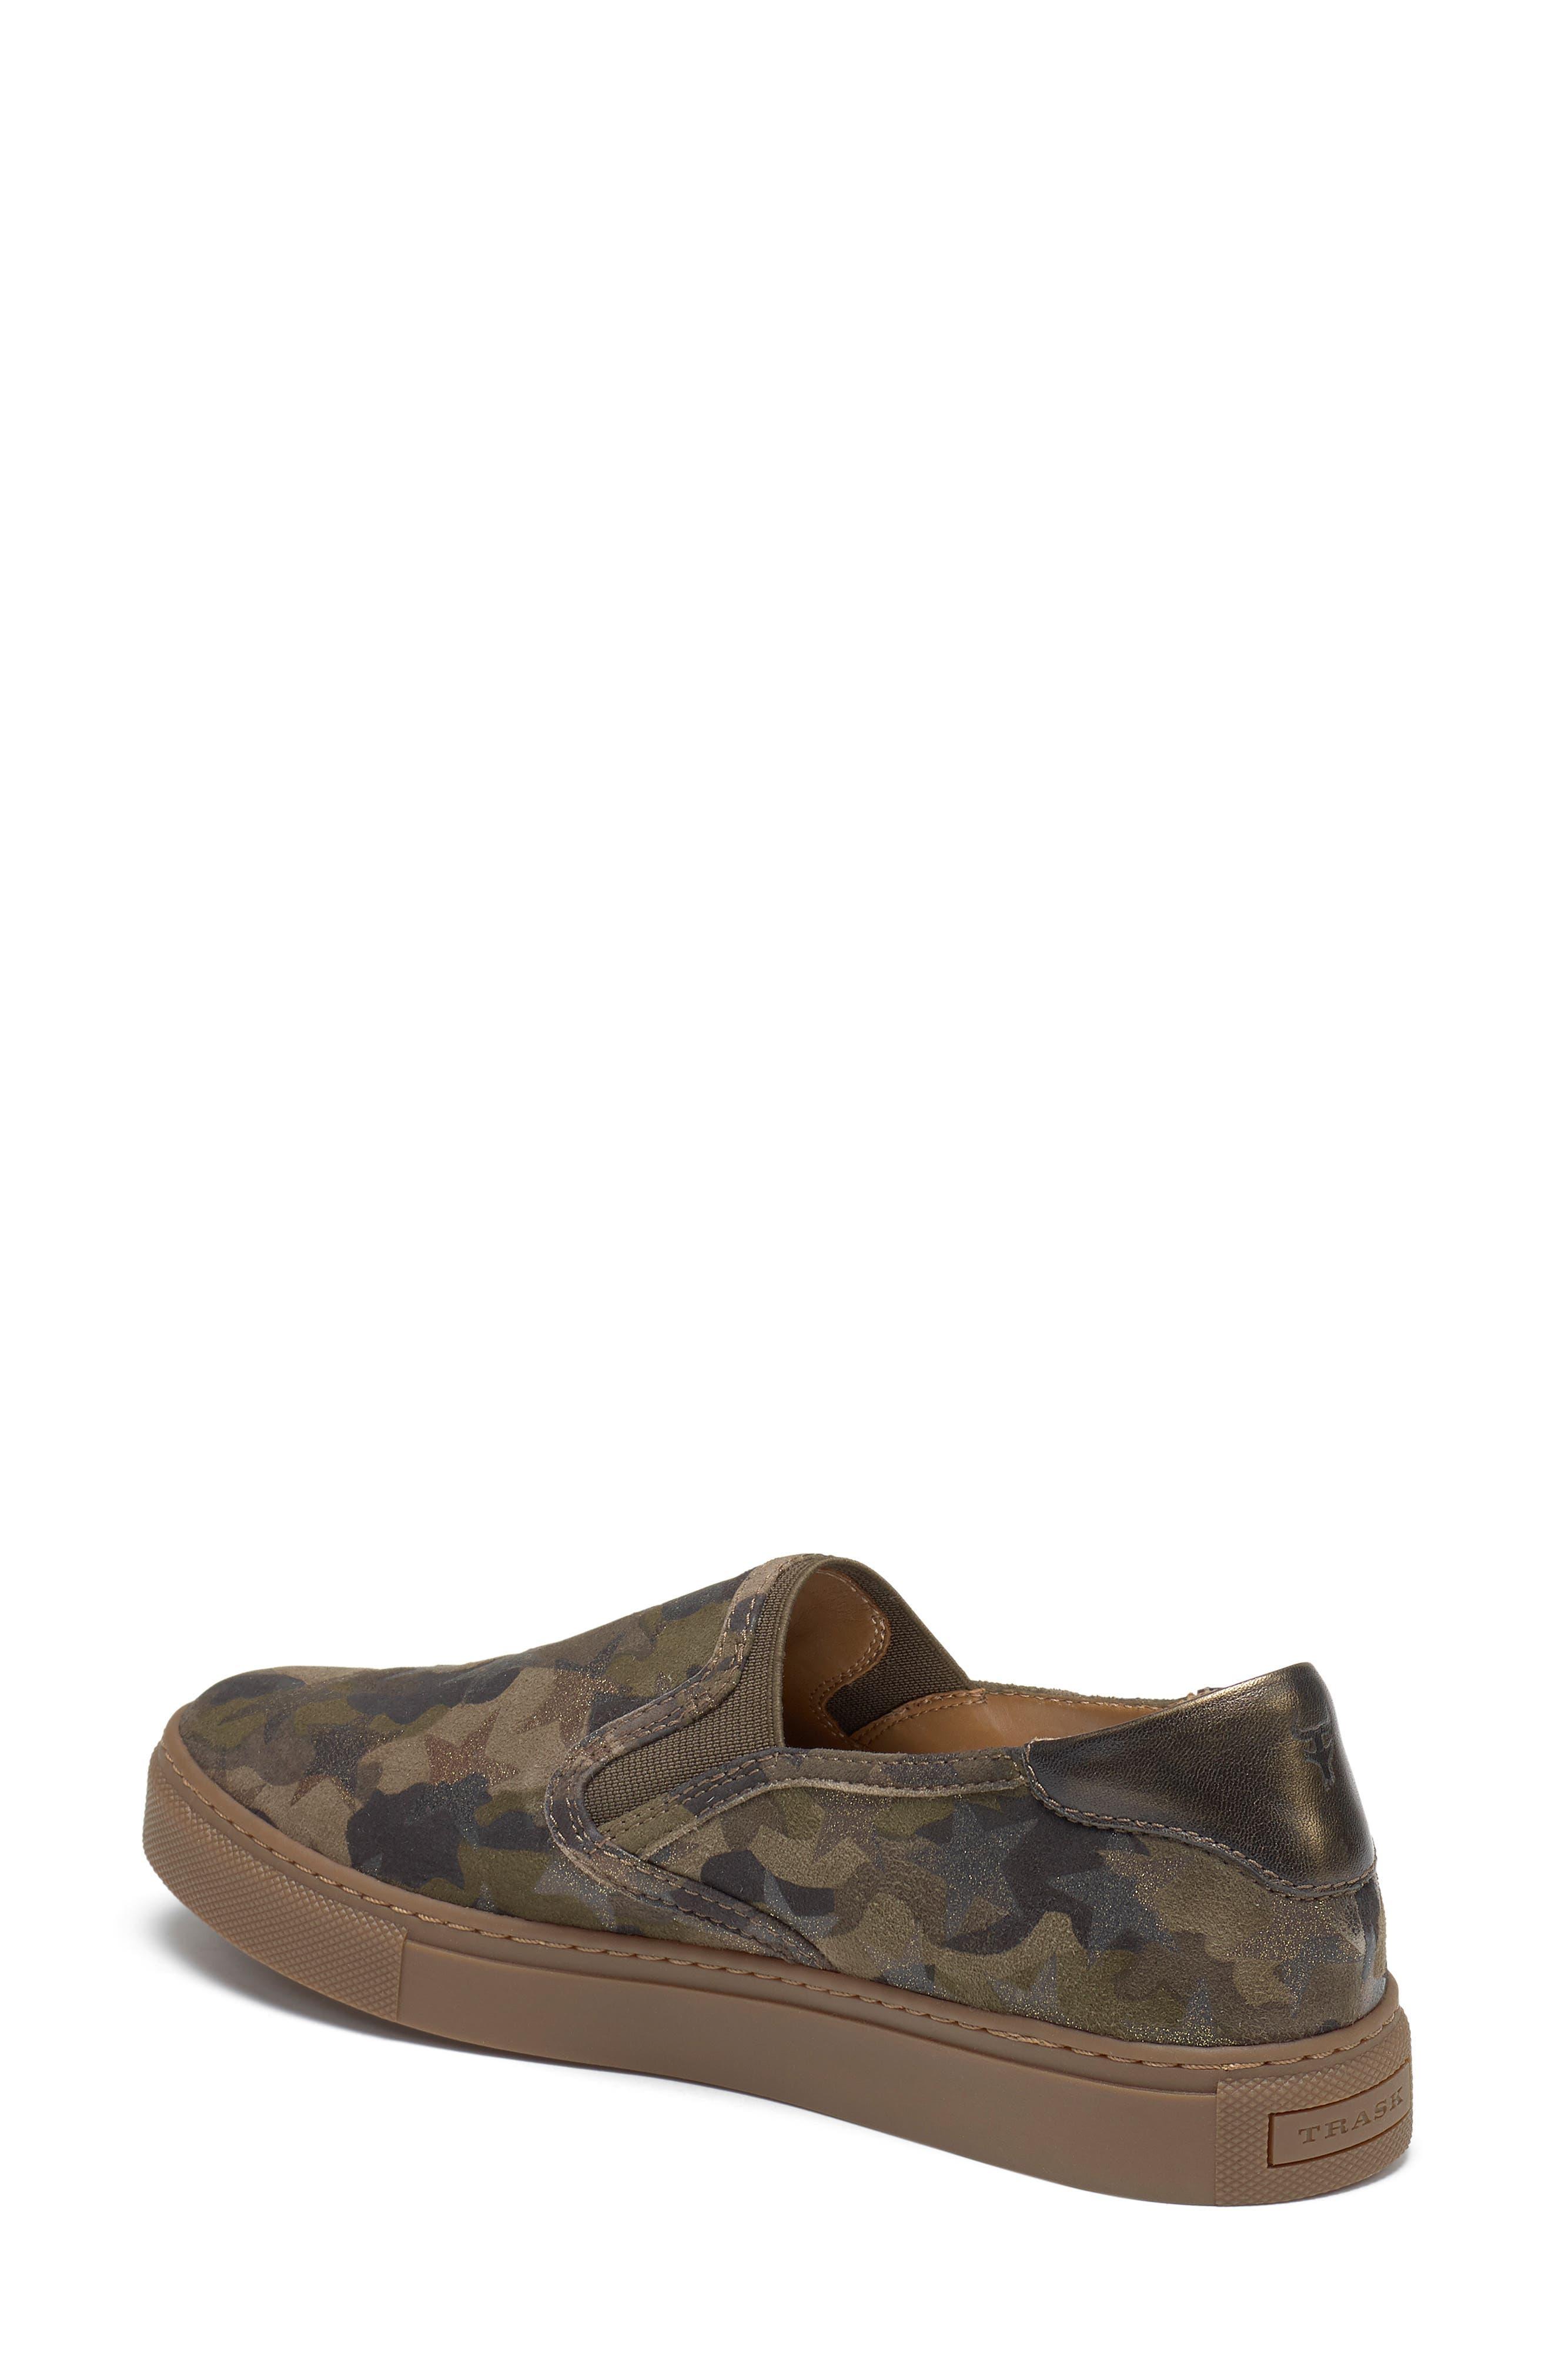 Lillian Water Resistant Slip-On Sneaker,                             Alternate thumbnail 2, color,                             OLIVE STAR PRINT SUEDE